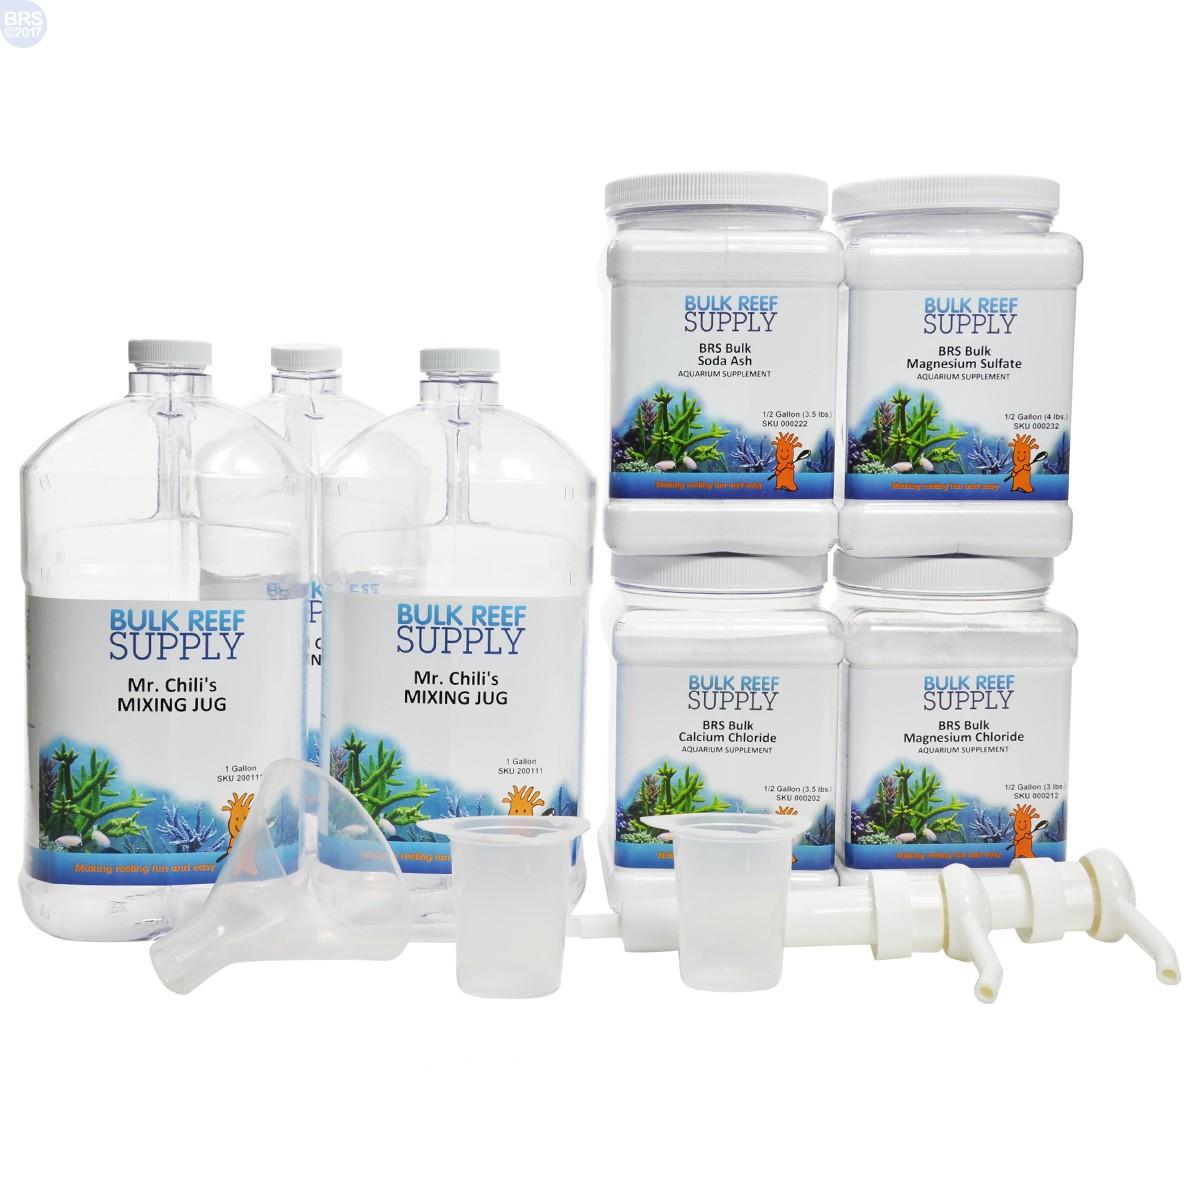 Brs 2 Part Calcium Amp Alkalinity Total Package Bulk